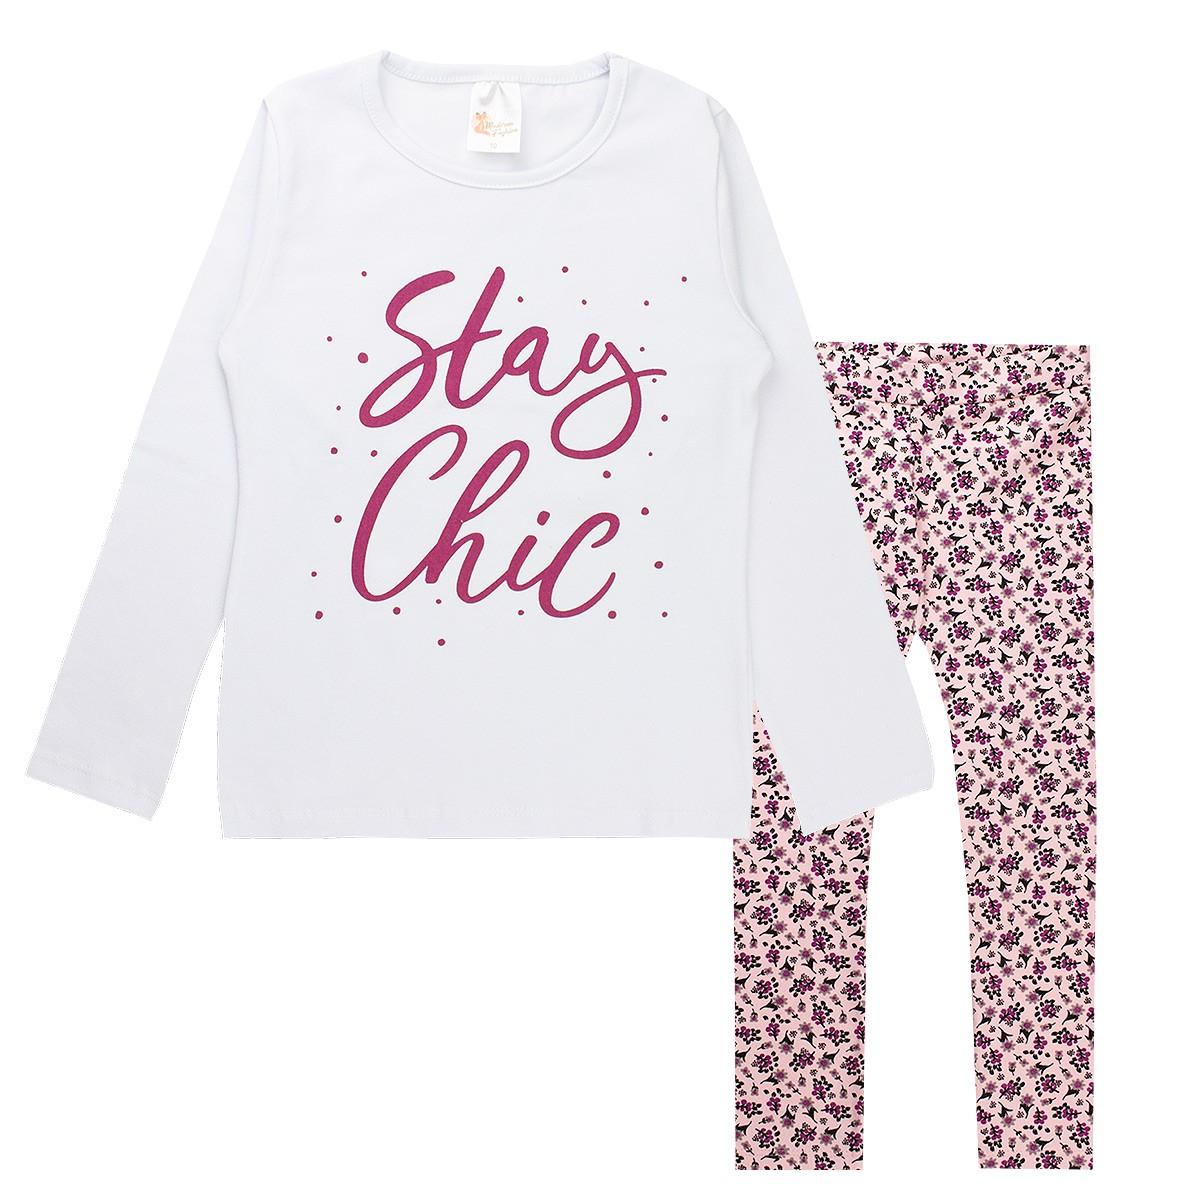 Conjunto Infantil Menina Estampado Cotton Stay Chic - Branco